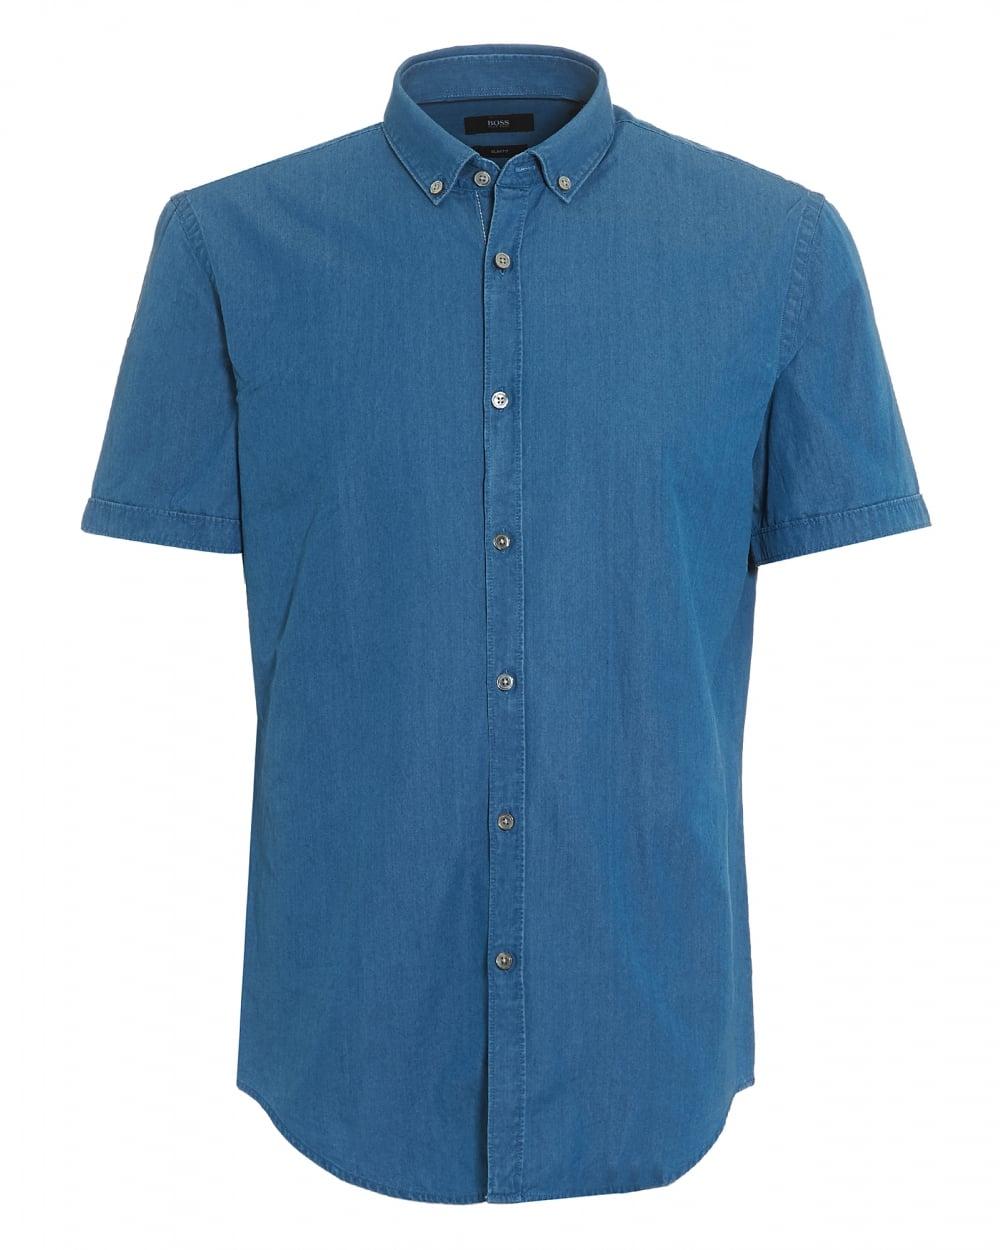 41d3ffb1e2 Hugo Boss Black Mens Rik Short Sleeve Blue Chambray Shirt